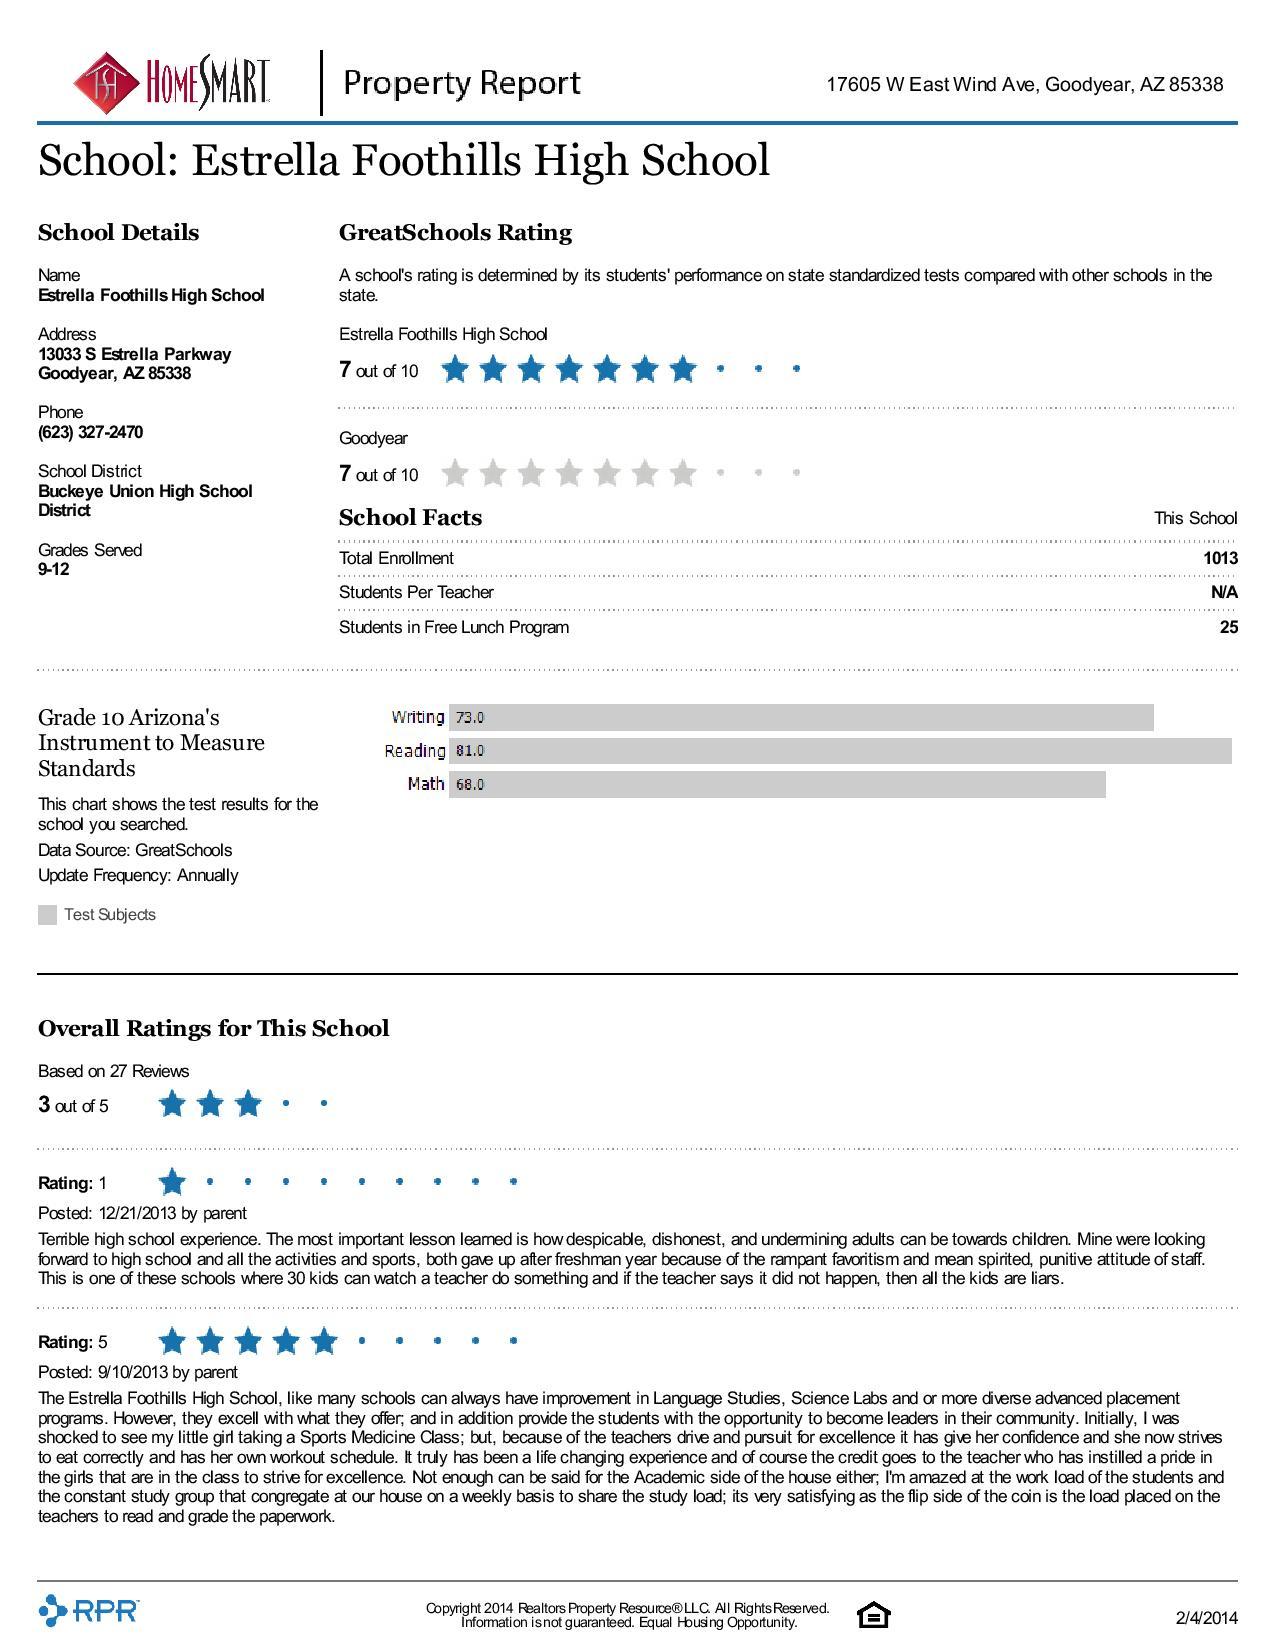 17605-W-East-Wind-Ave-Goodyear-AZ-85338.pdf-page-008